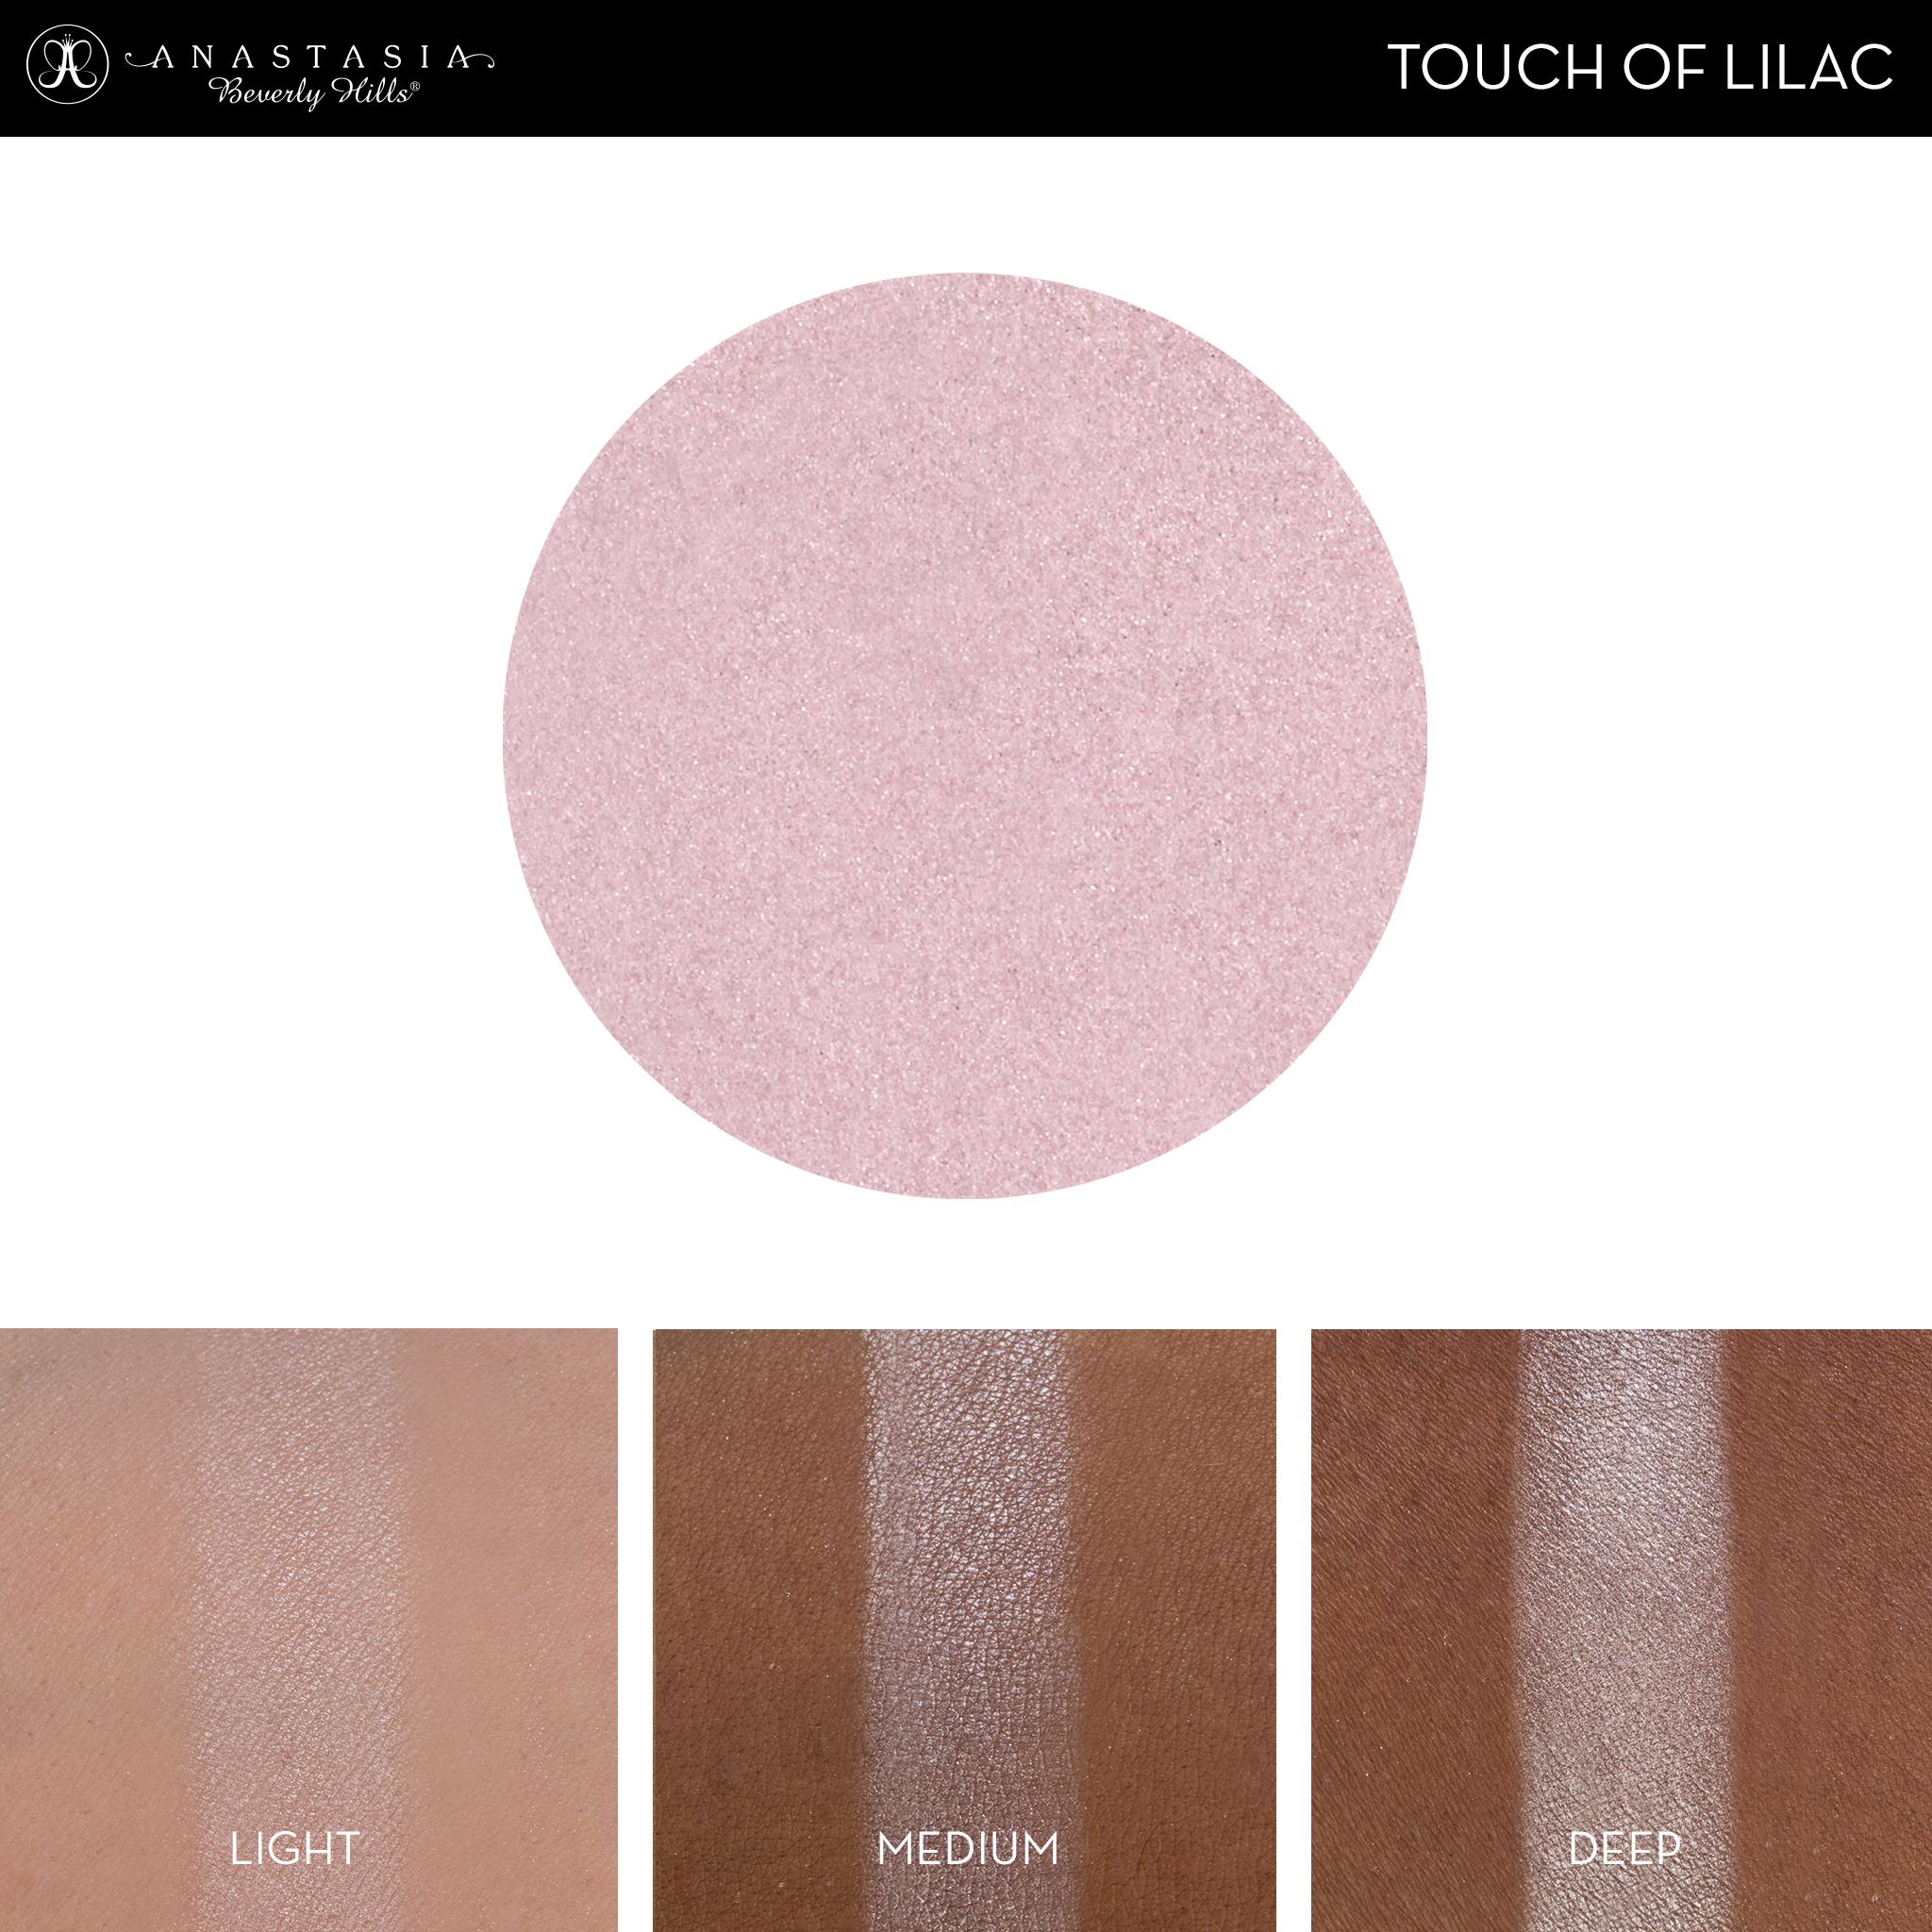 Ana Stasia & Co eyeshadow singles - sunset | rose gold eyeshadow, eyeshadow